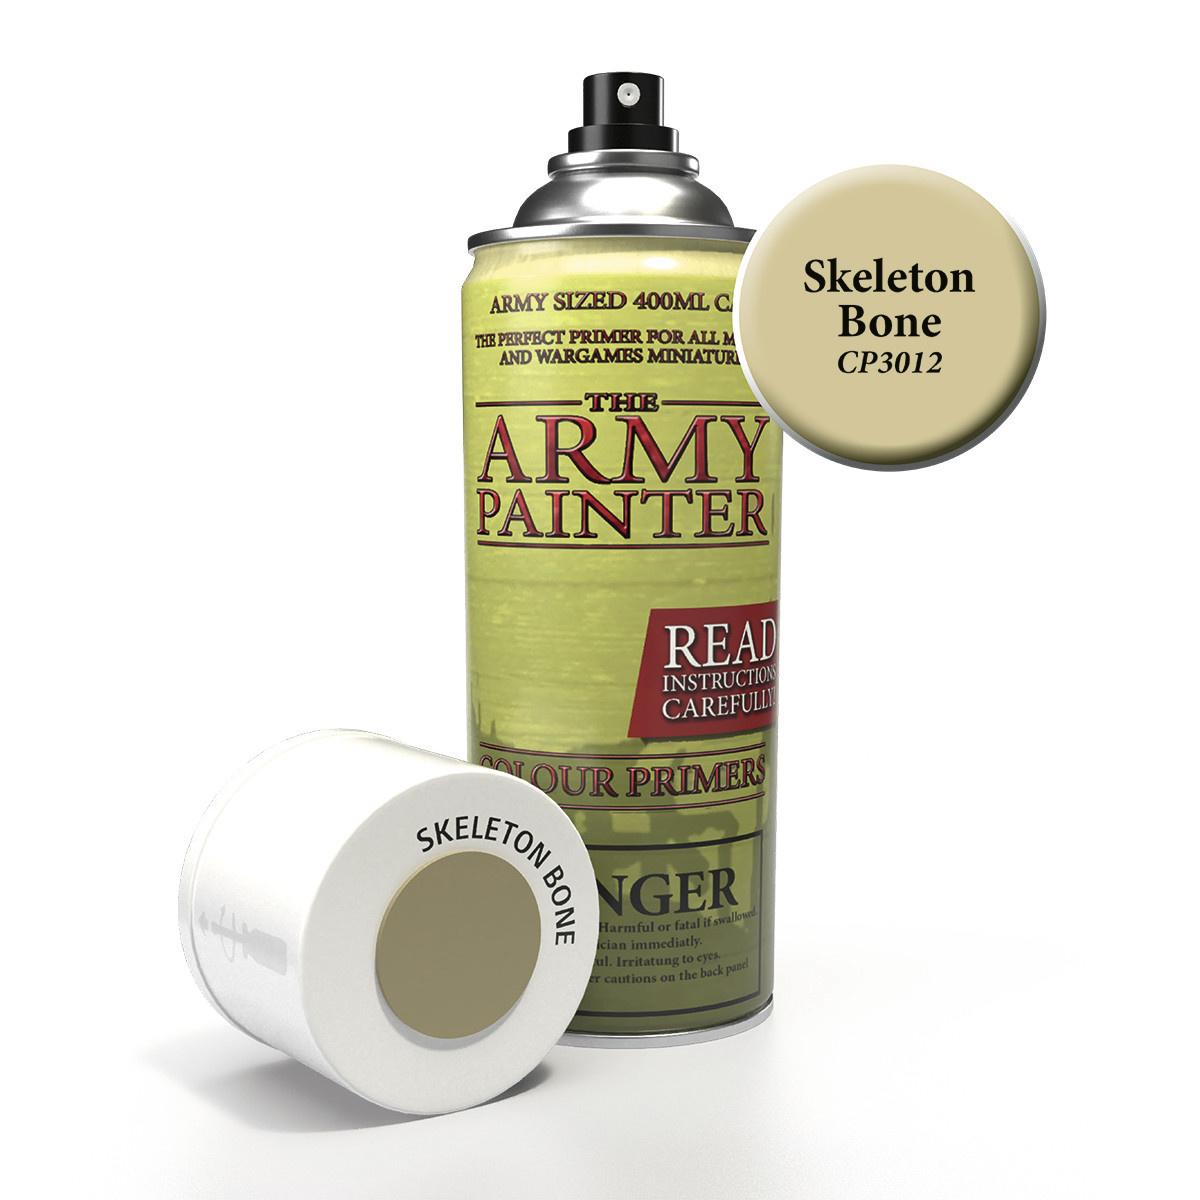 Army Painter Primer: Colour Skeleton Bone